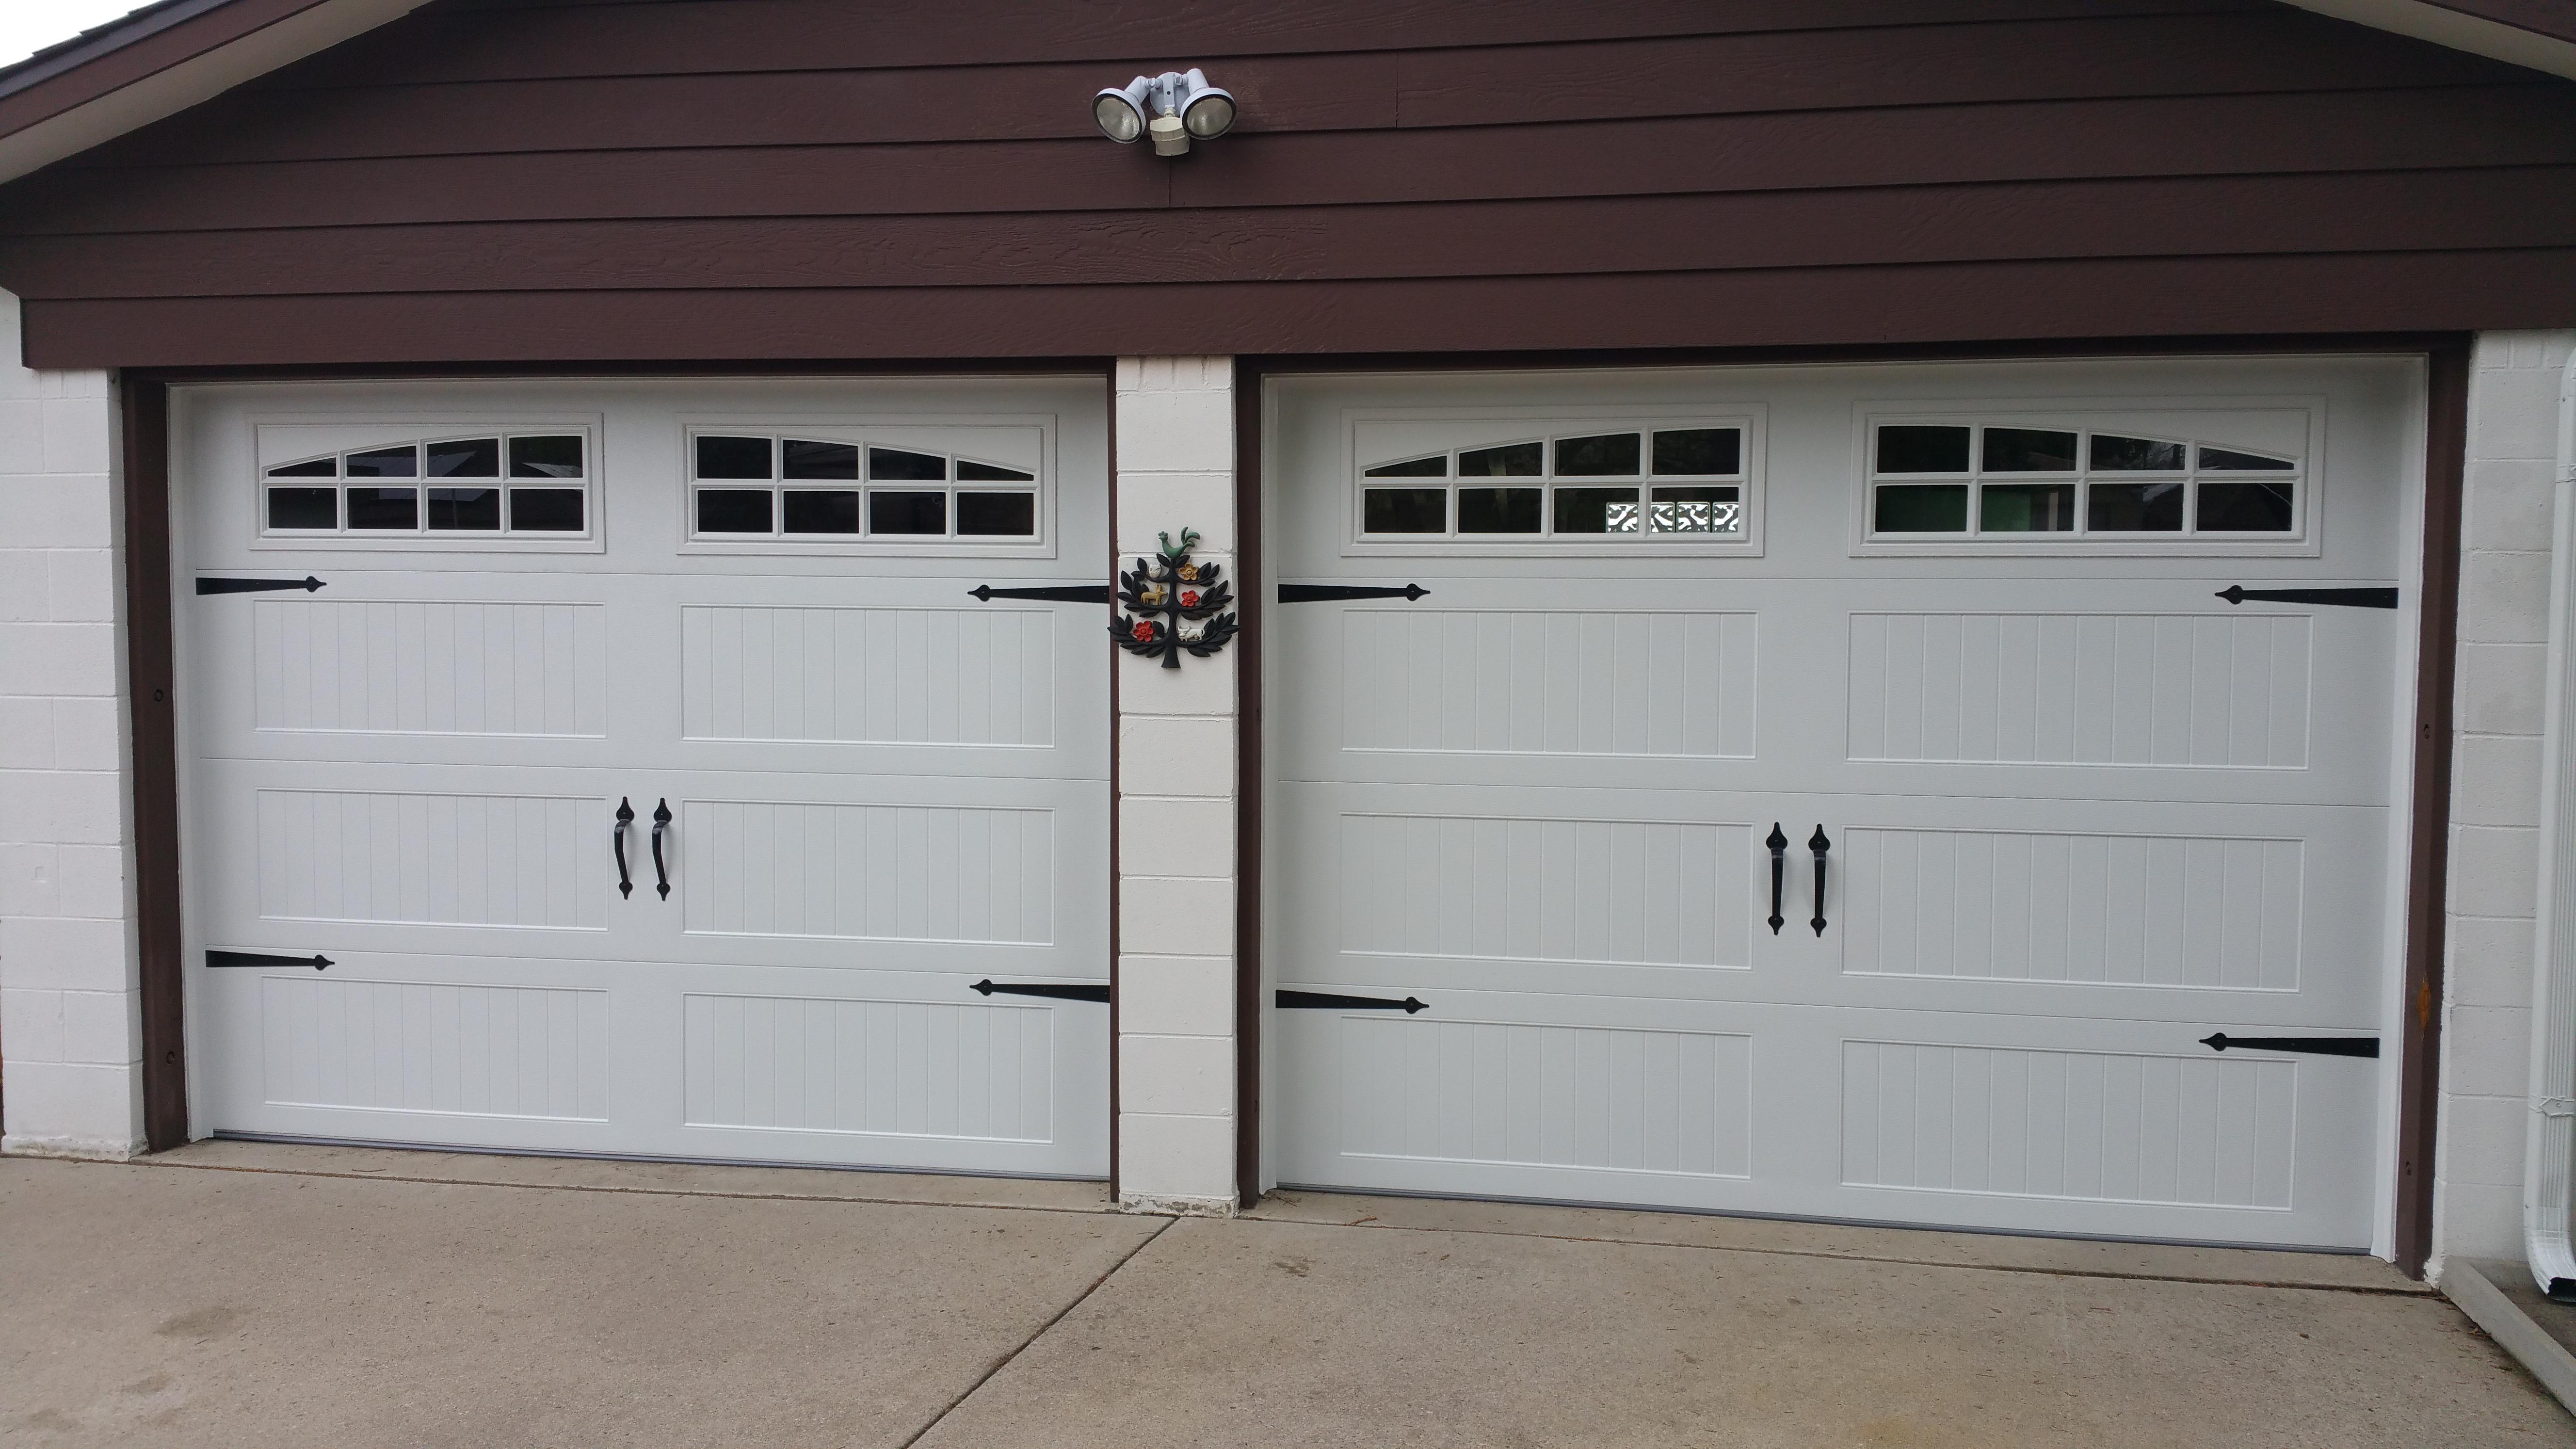 united trading co pin uae suppliers european dubai on garage supplier door llc in by doors